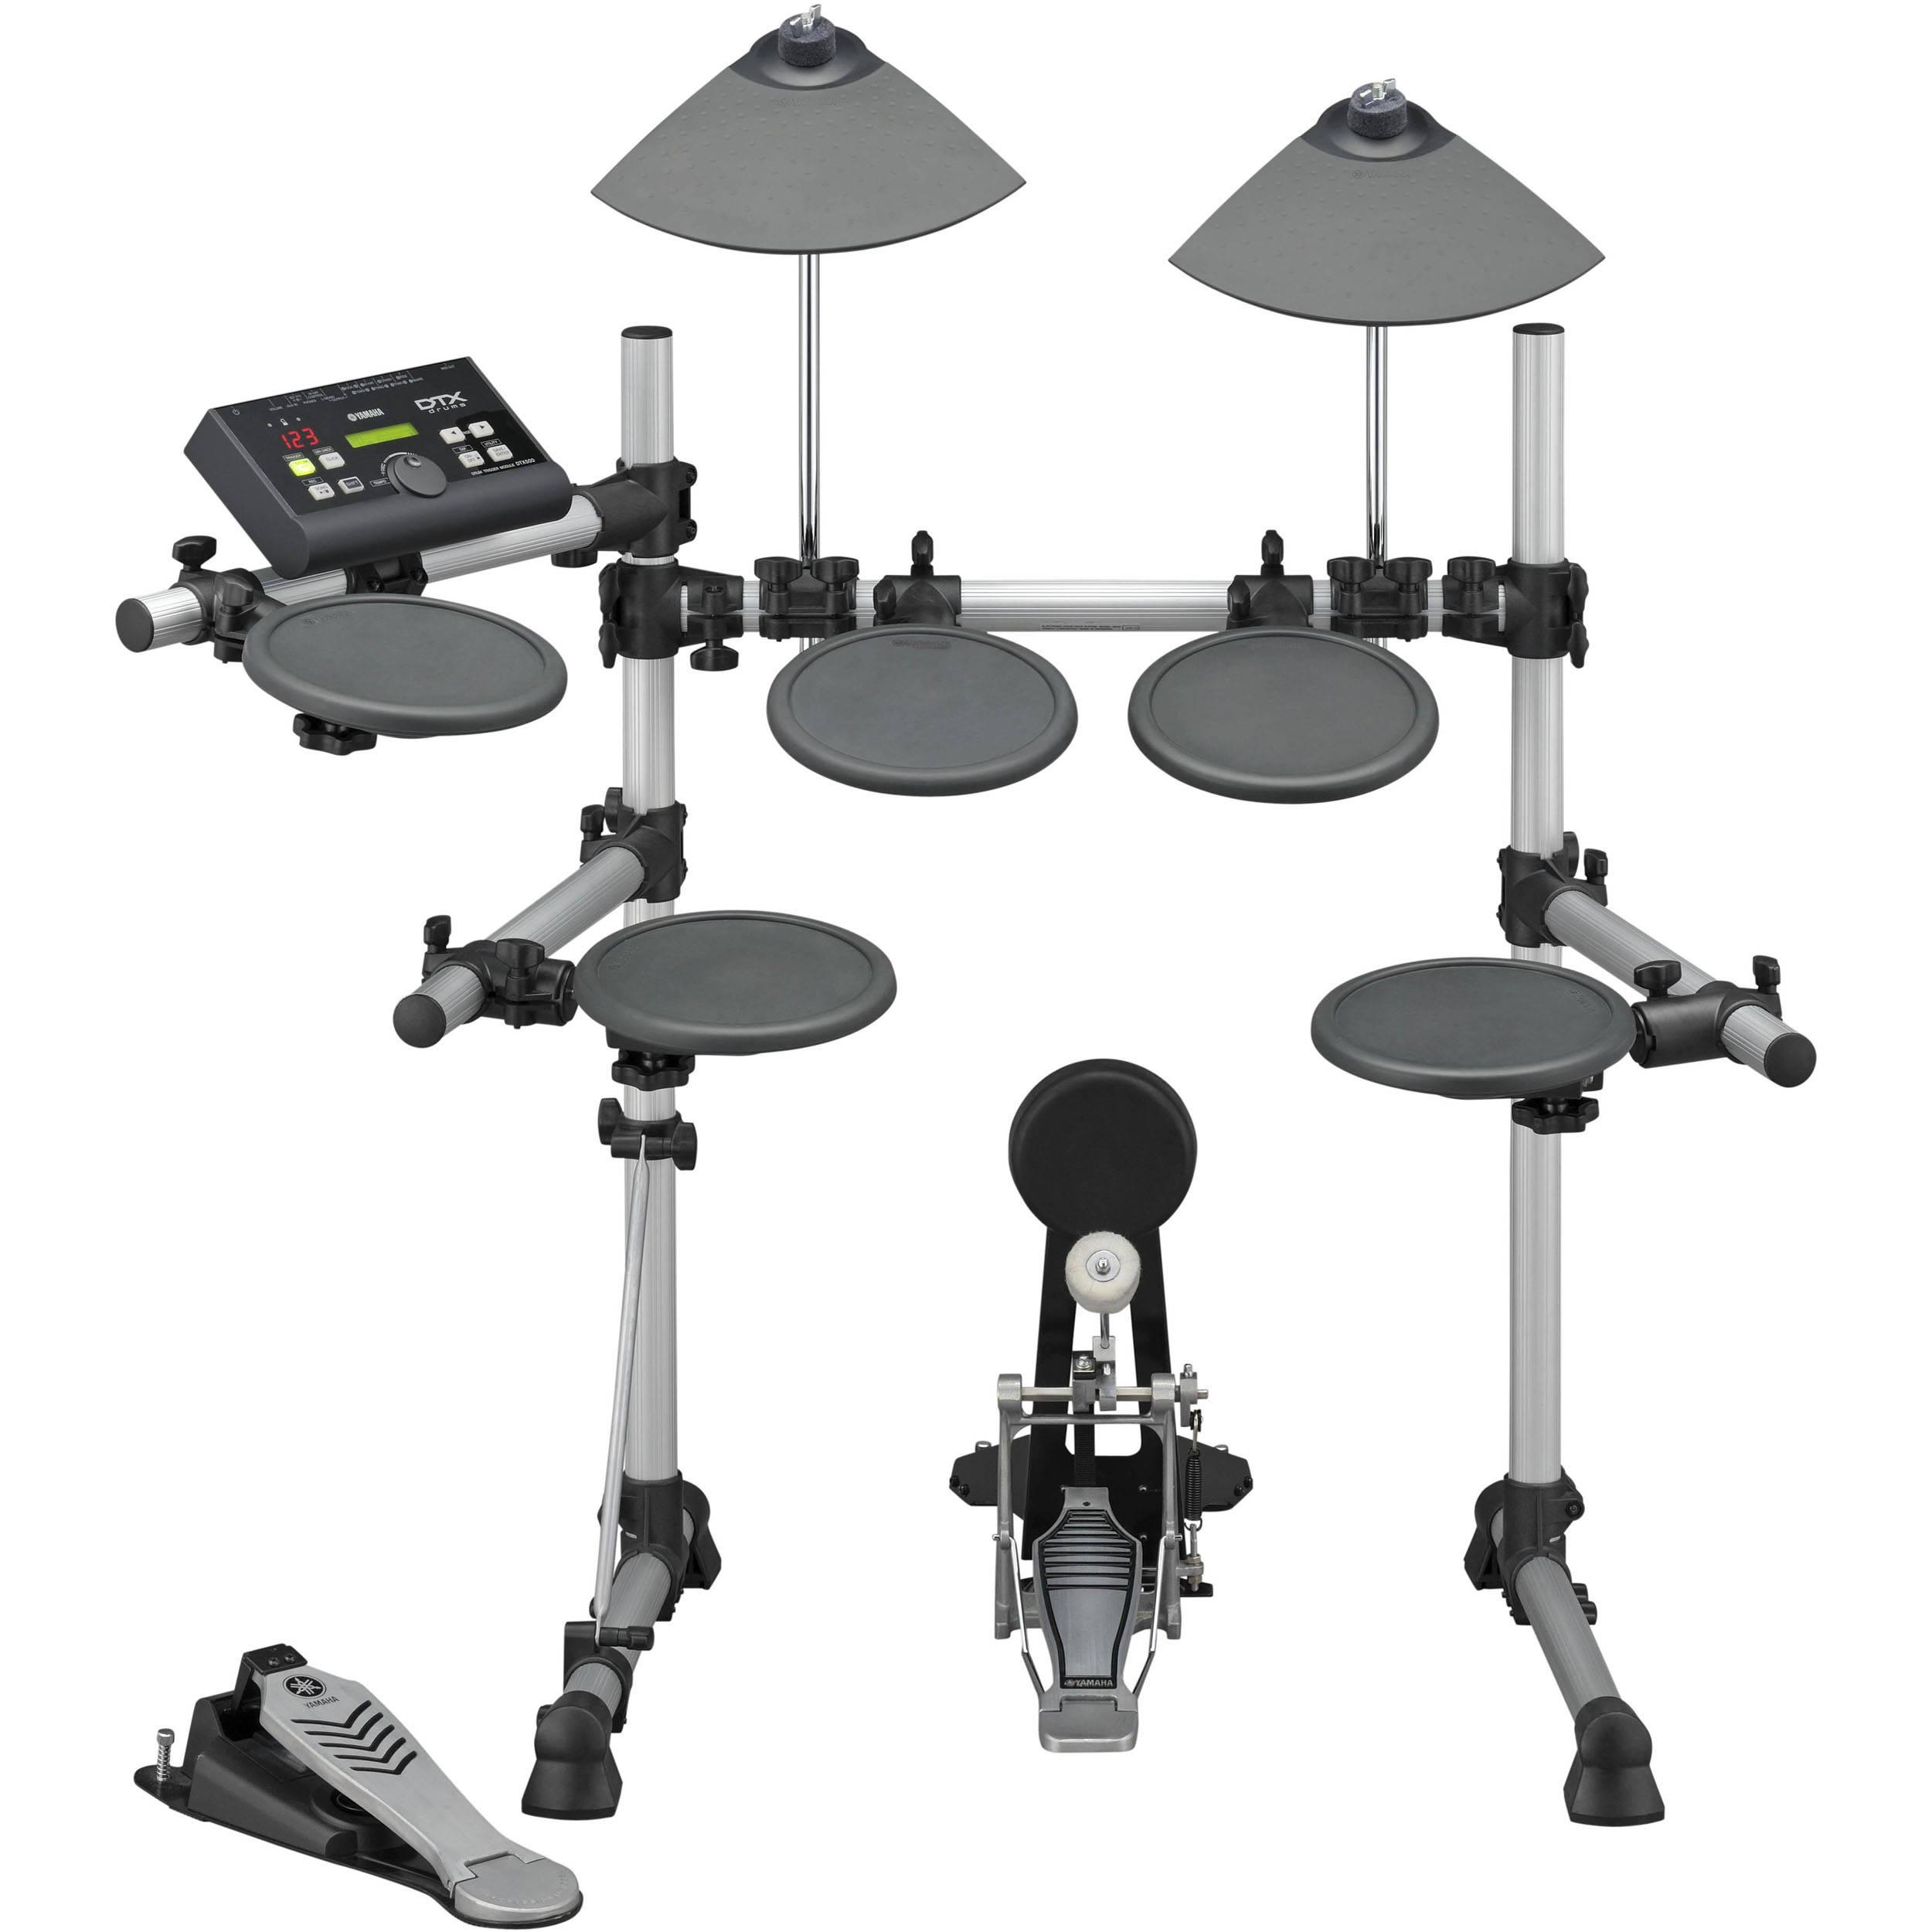 yamaha dtx500k electronic drum set b h kit dtx500k b h photo